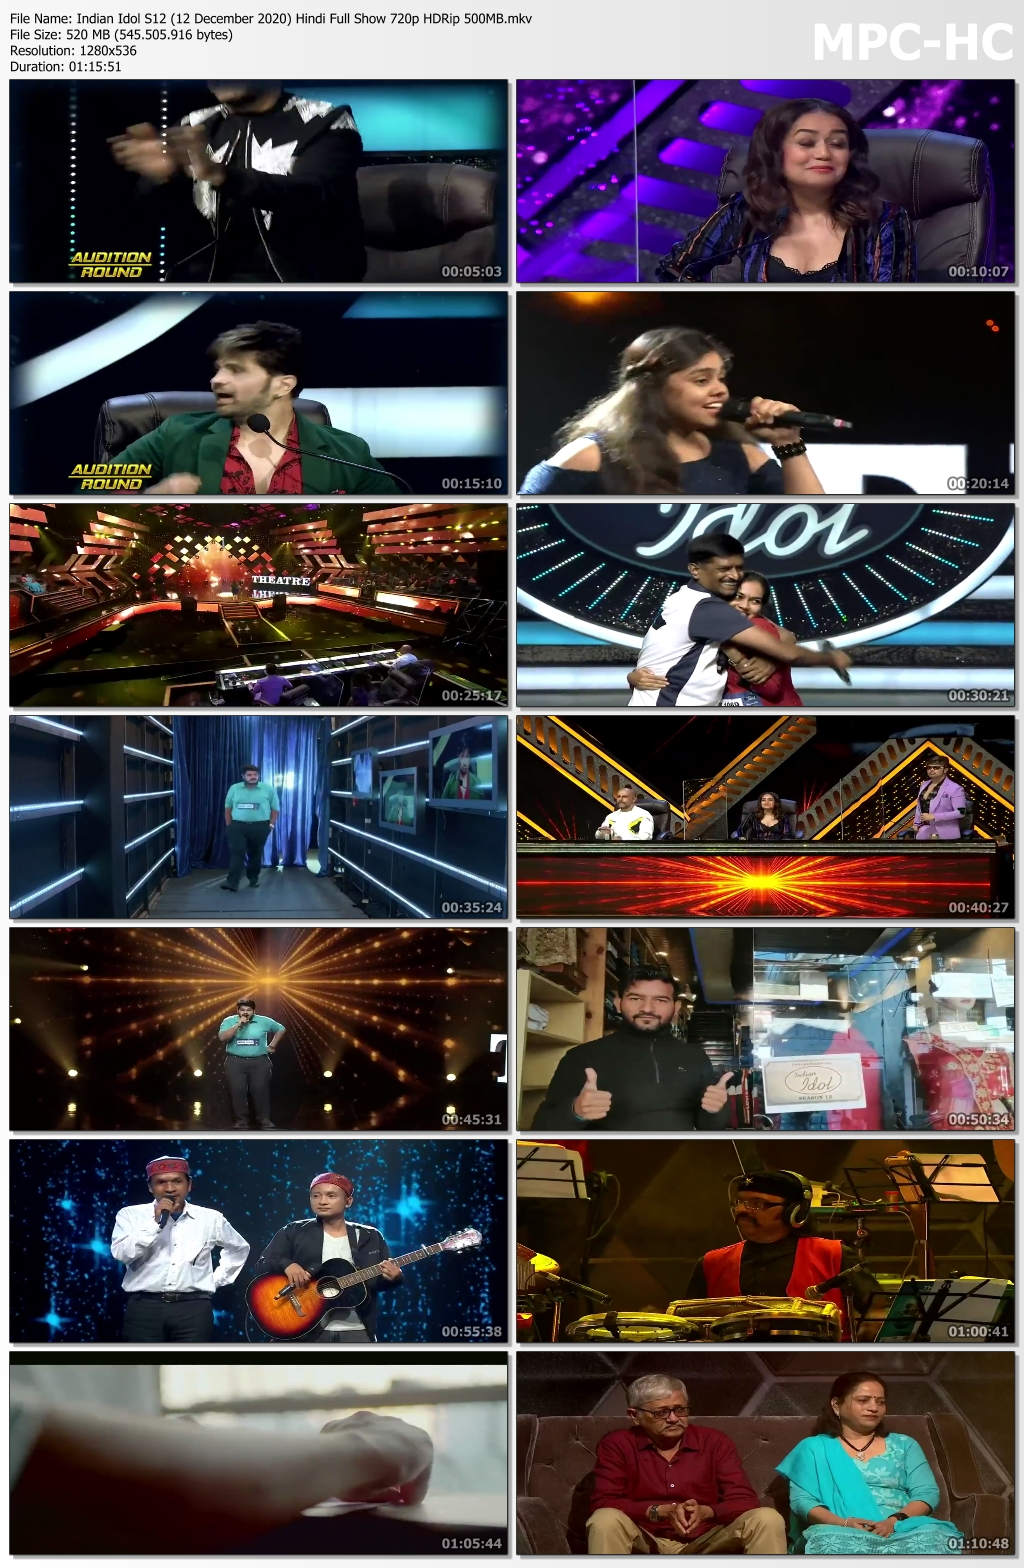 Indian-Idol-S12-12-December-2020-Hindi-Full-Show-720p-HDRip-500-MB-mkv-thumbs